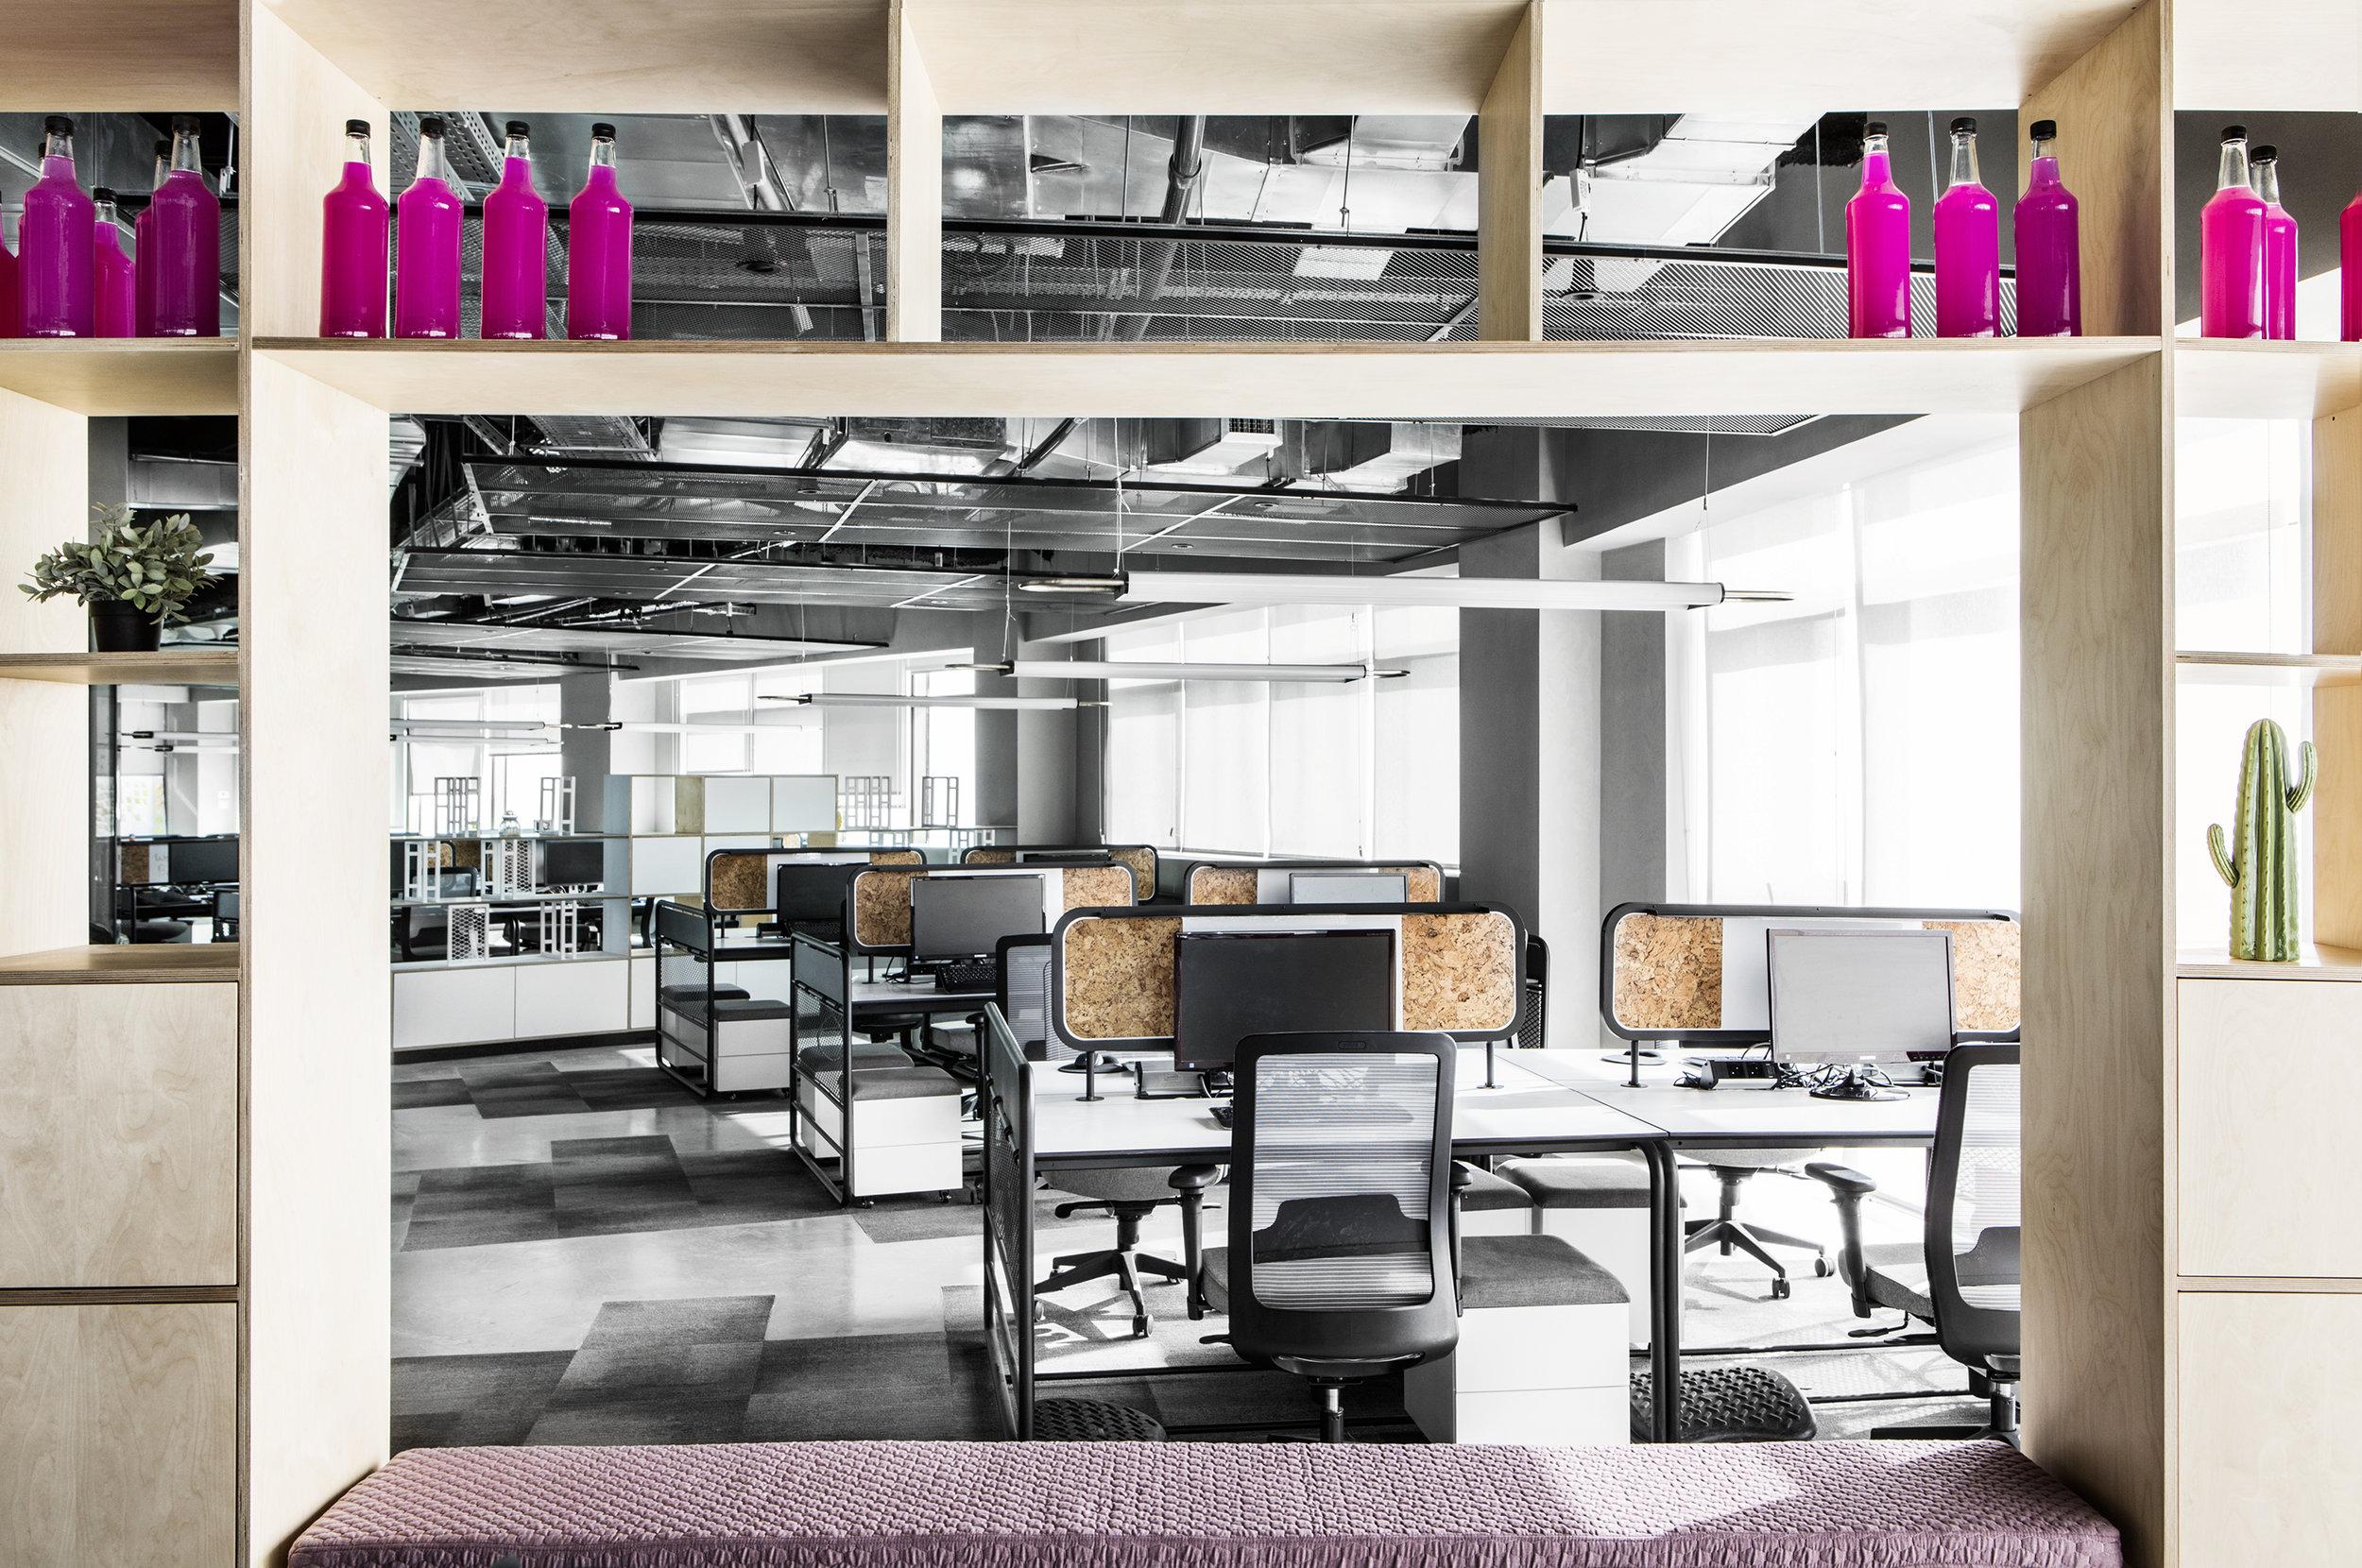 031_optimove - roy david architecture studio.jpg.jpg